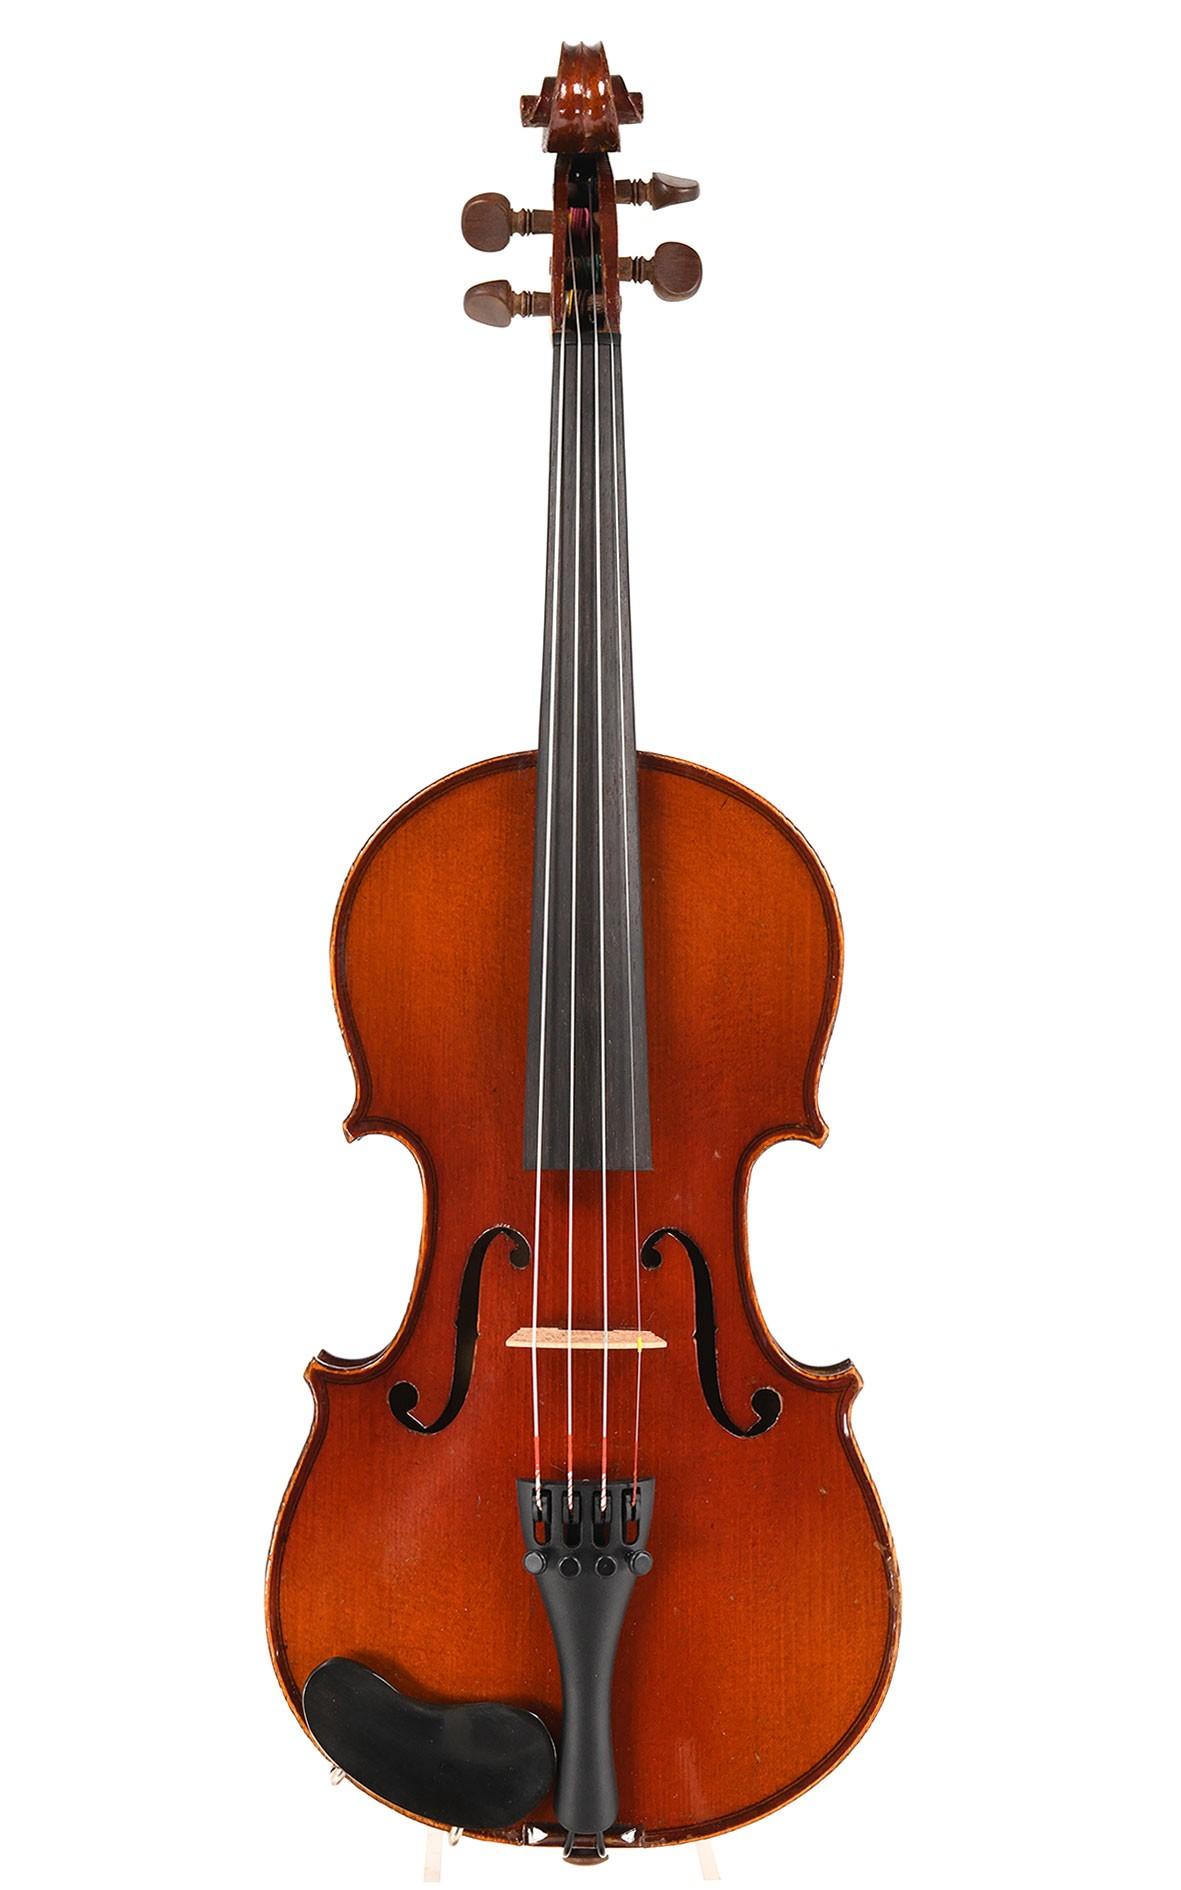 Demi violon de Mirecourt